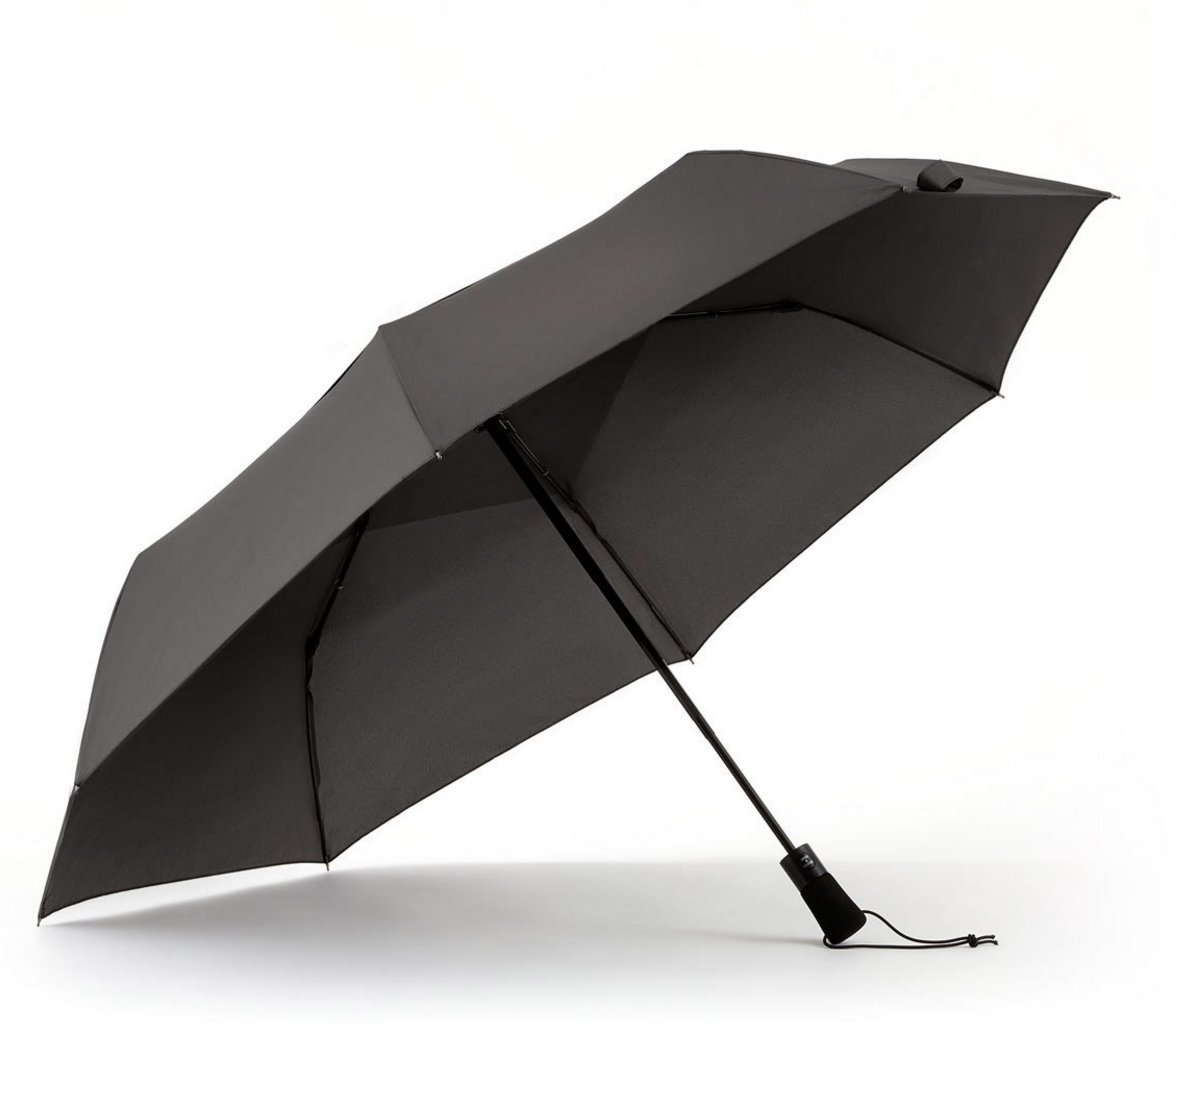 ShedRain WindPro Vented Auto Open/Auto Close Jumbo Compact Wind Umbrella: Charcoal by ShedRain